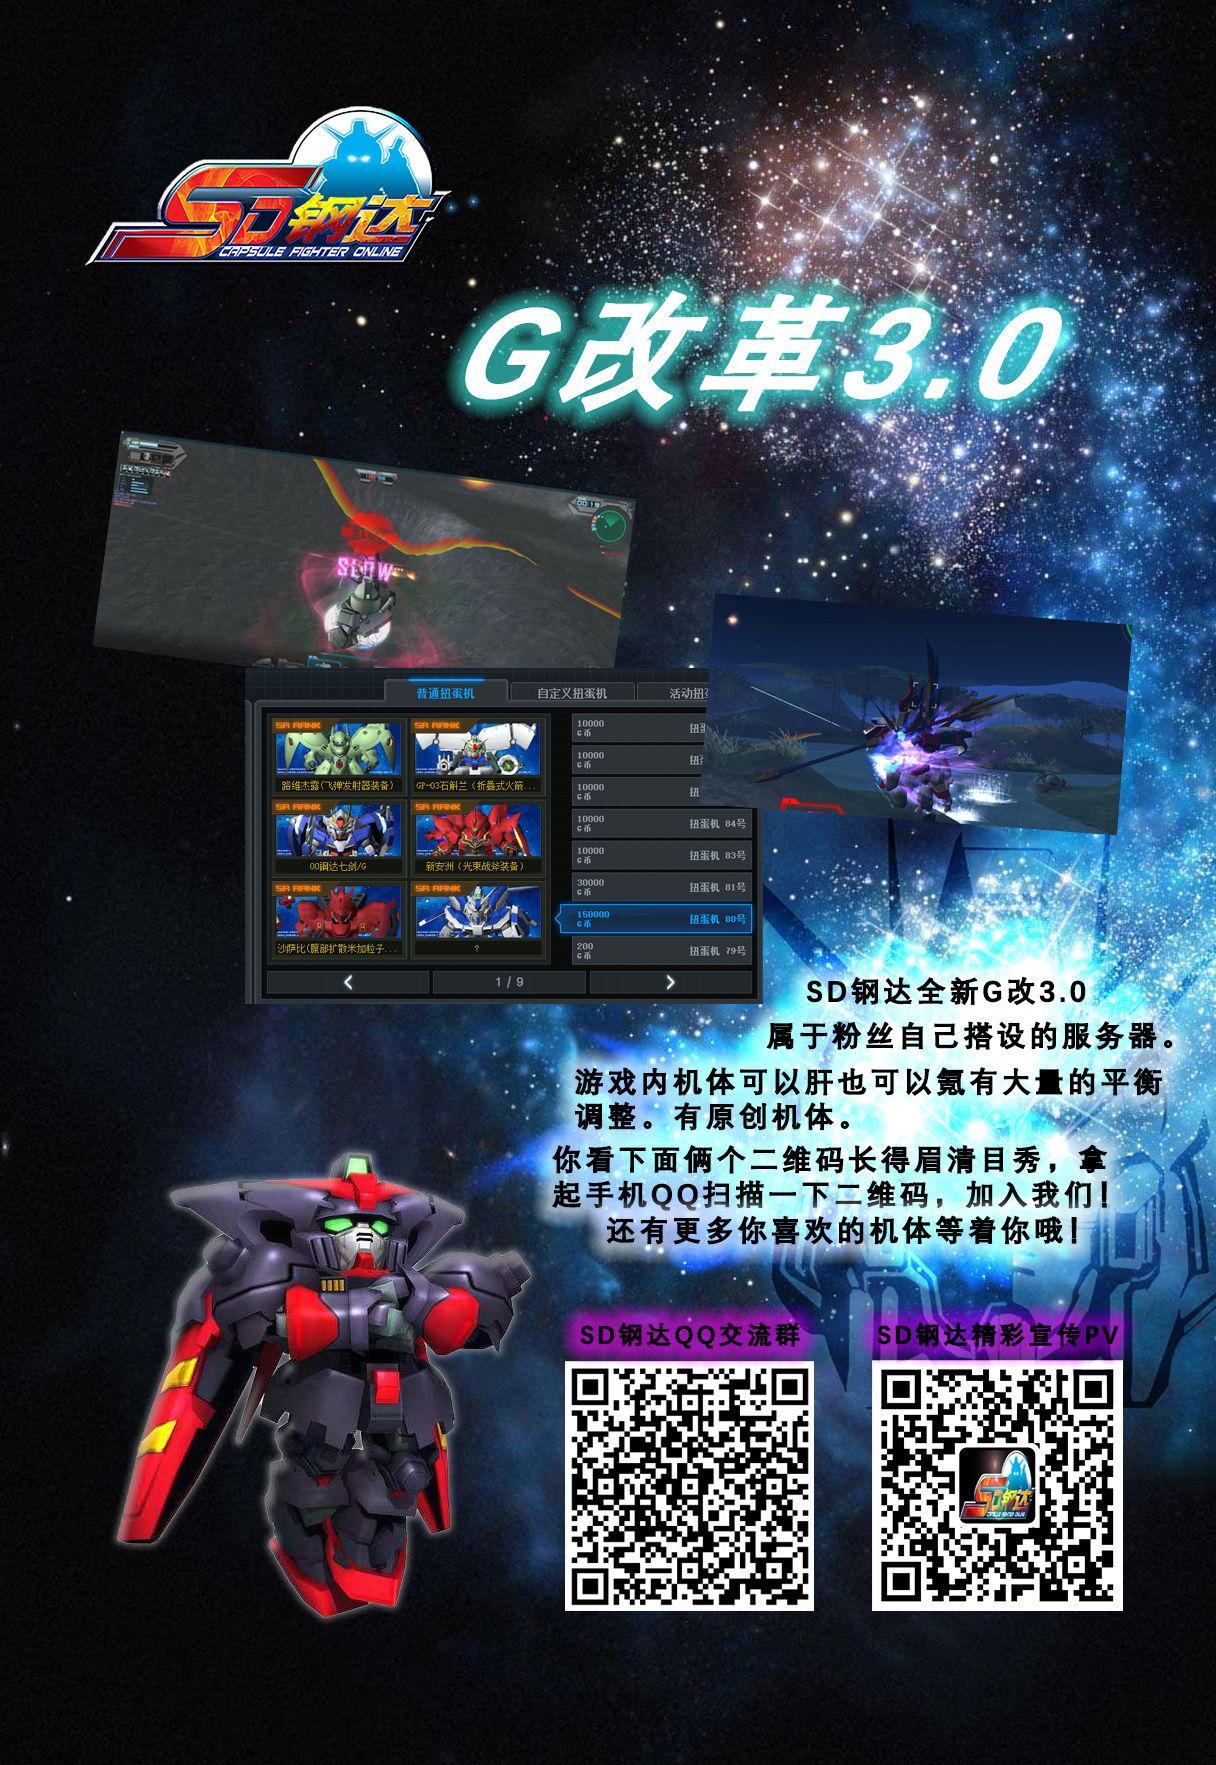 [Erect Sawaru] Raikou Shinki Igis Magia -PANDRA saga 3rd ignition- Ch. 24 (COMIC Unreal 2020-08 Vol. 86) [Chinese] [不咕鸟汉化组] [Digital] 30